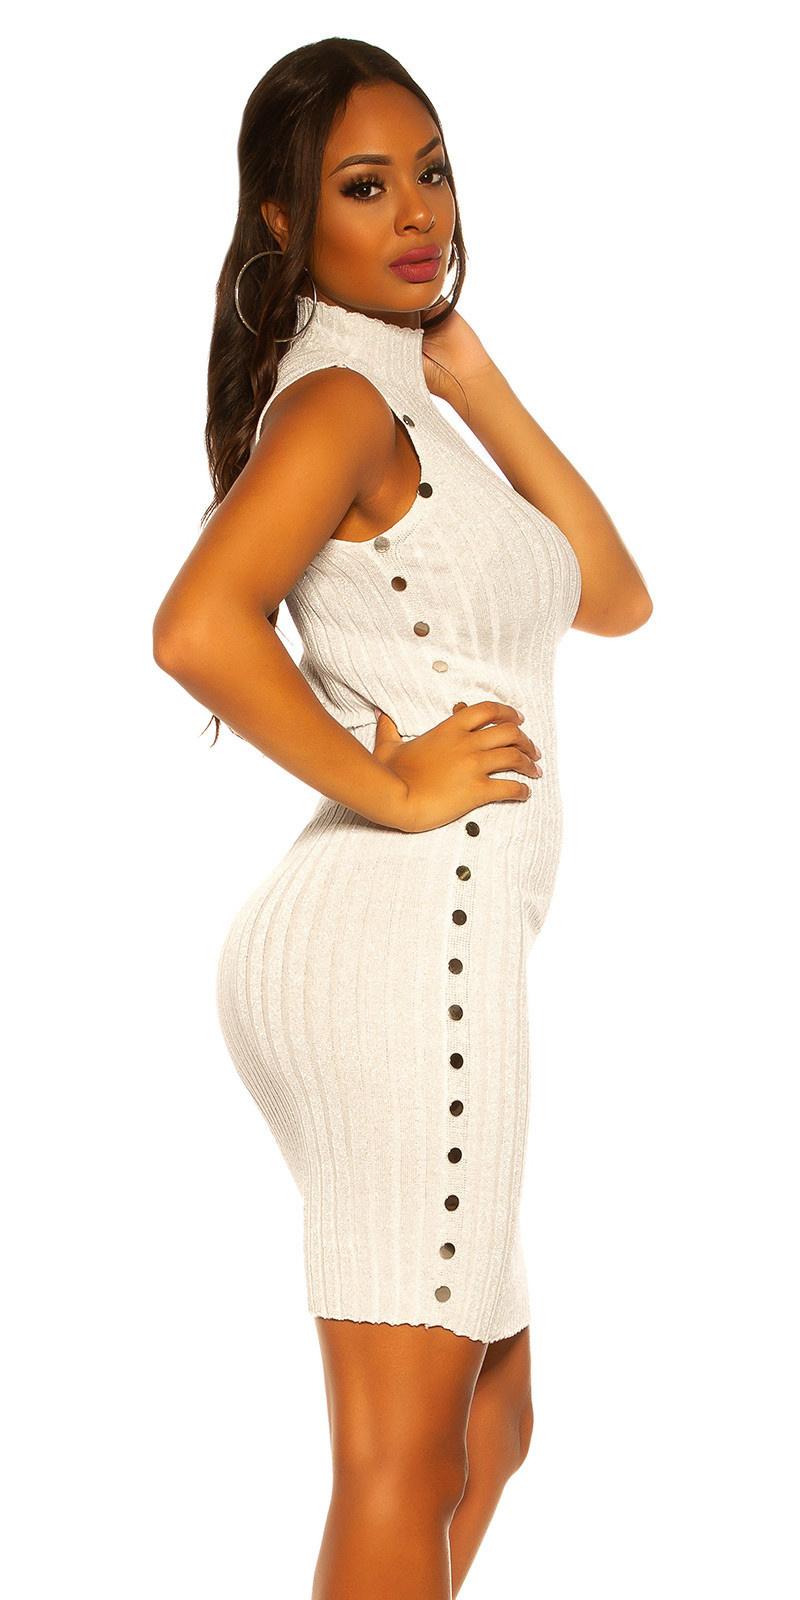 Sexy col gebreide jurk met lurex creme-kleurig